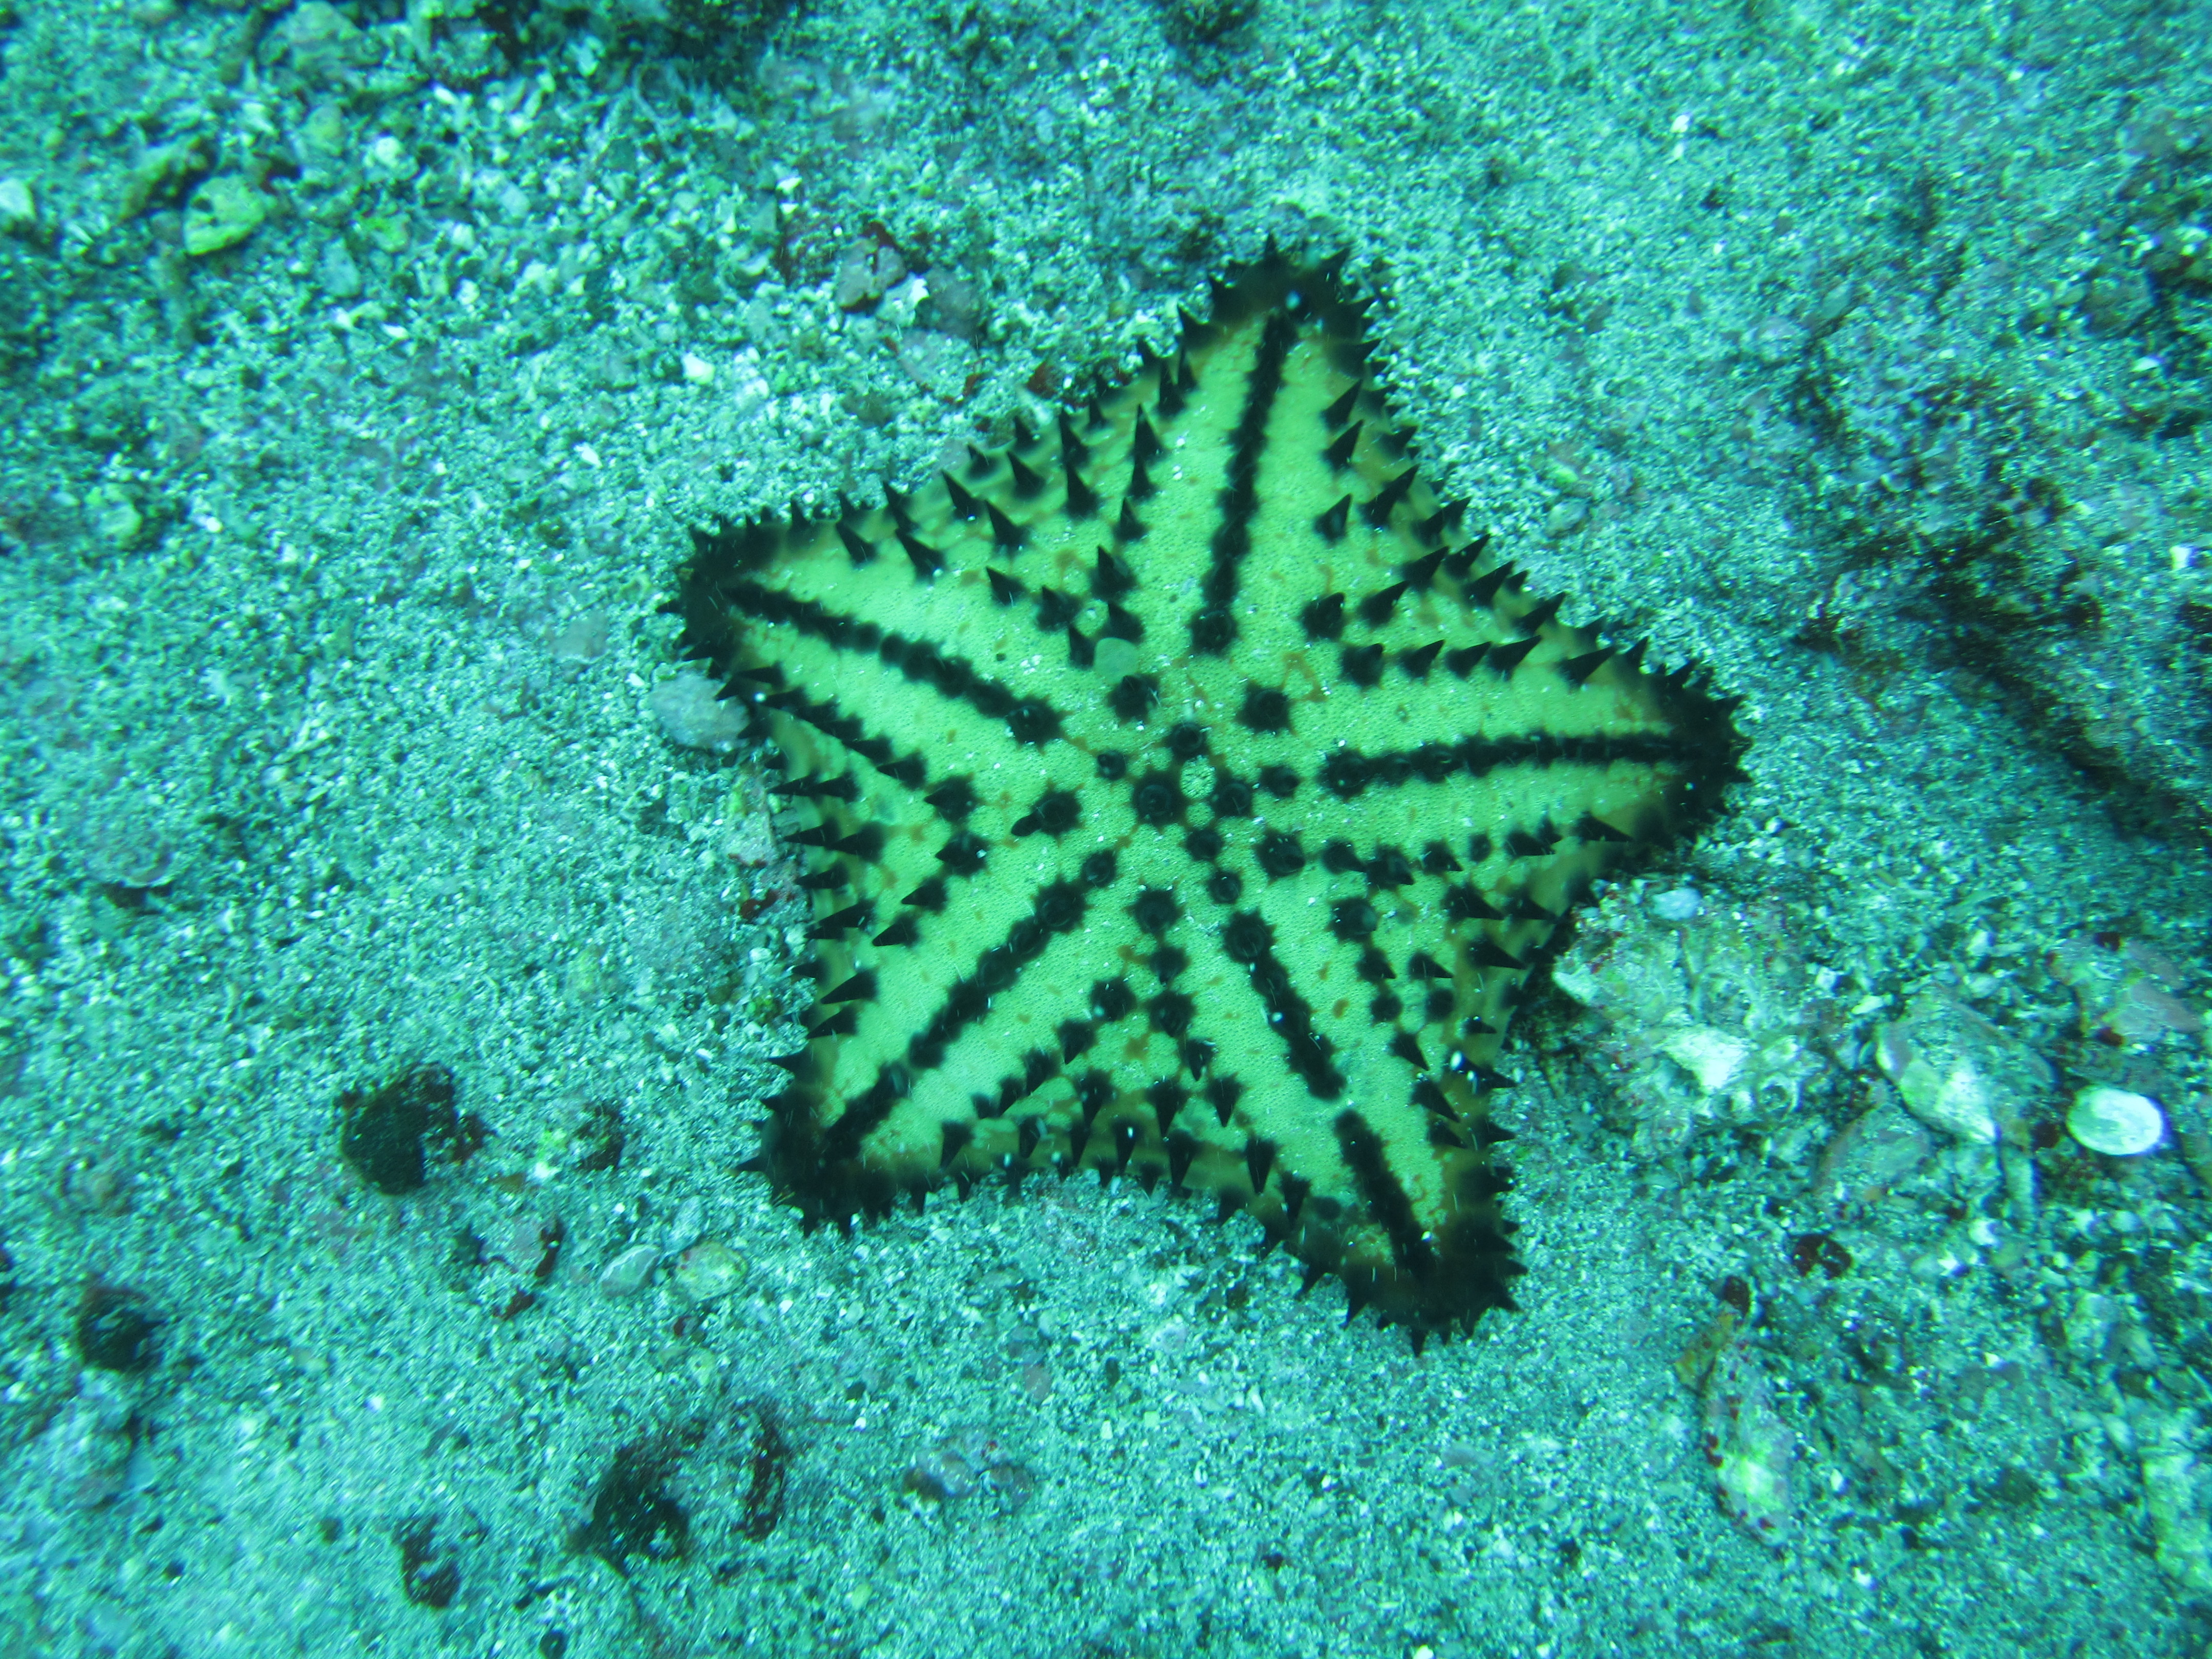 File:Chocolate Chip Sea Star.jpg - Wikimedia Commons